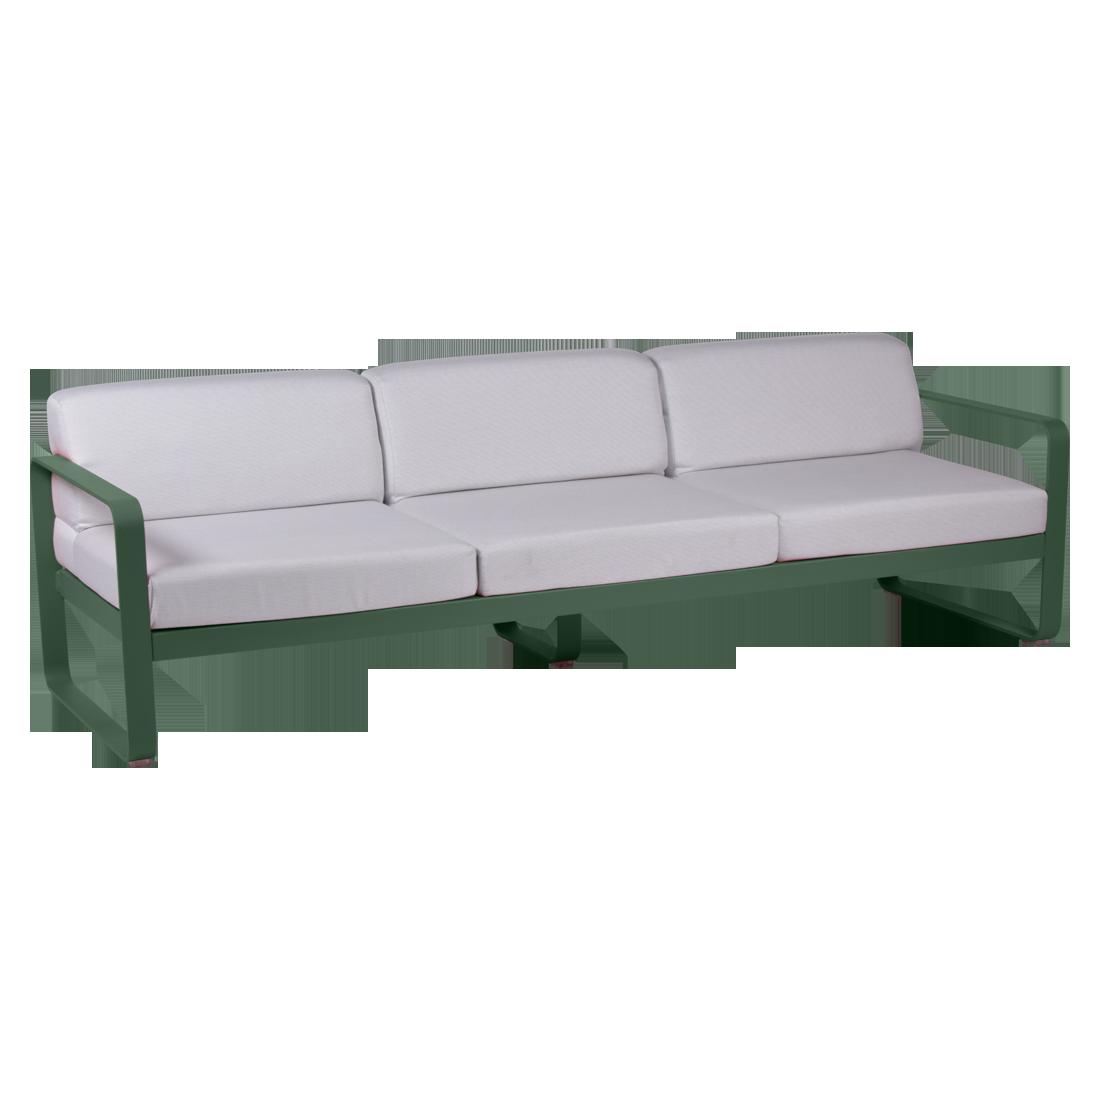 canape de jardin, canape d exterieur, canape fermob, canape metal, canape vert